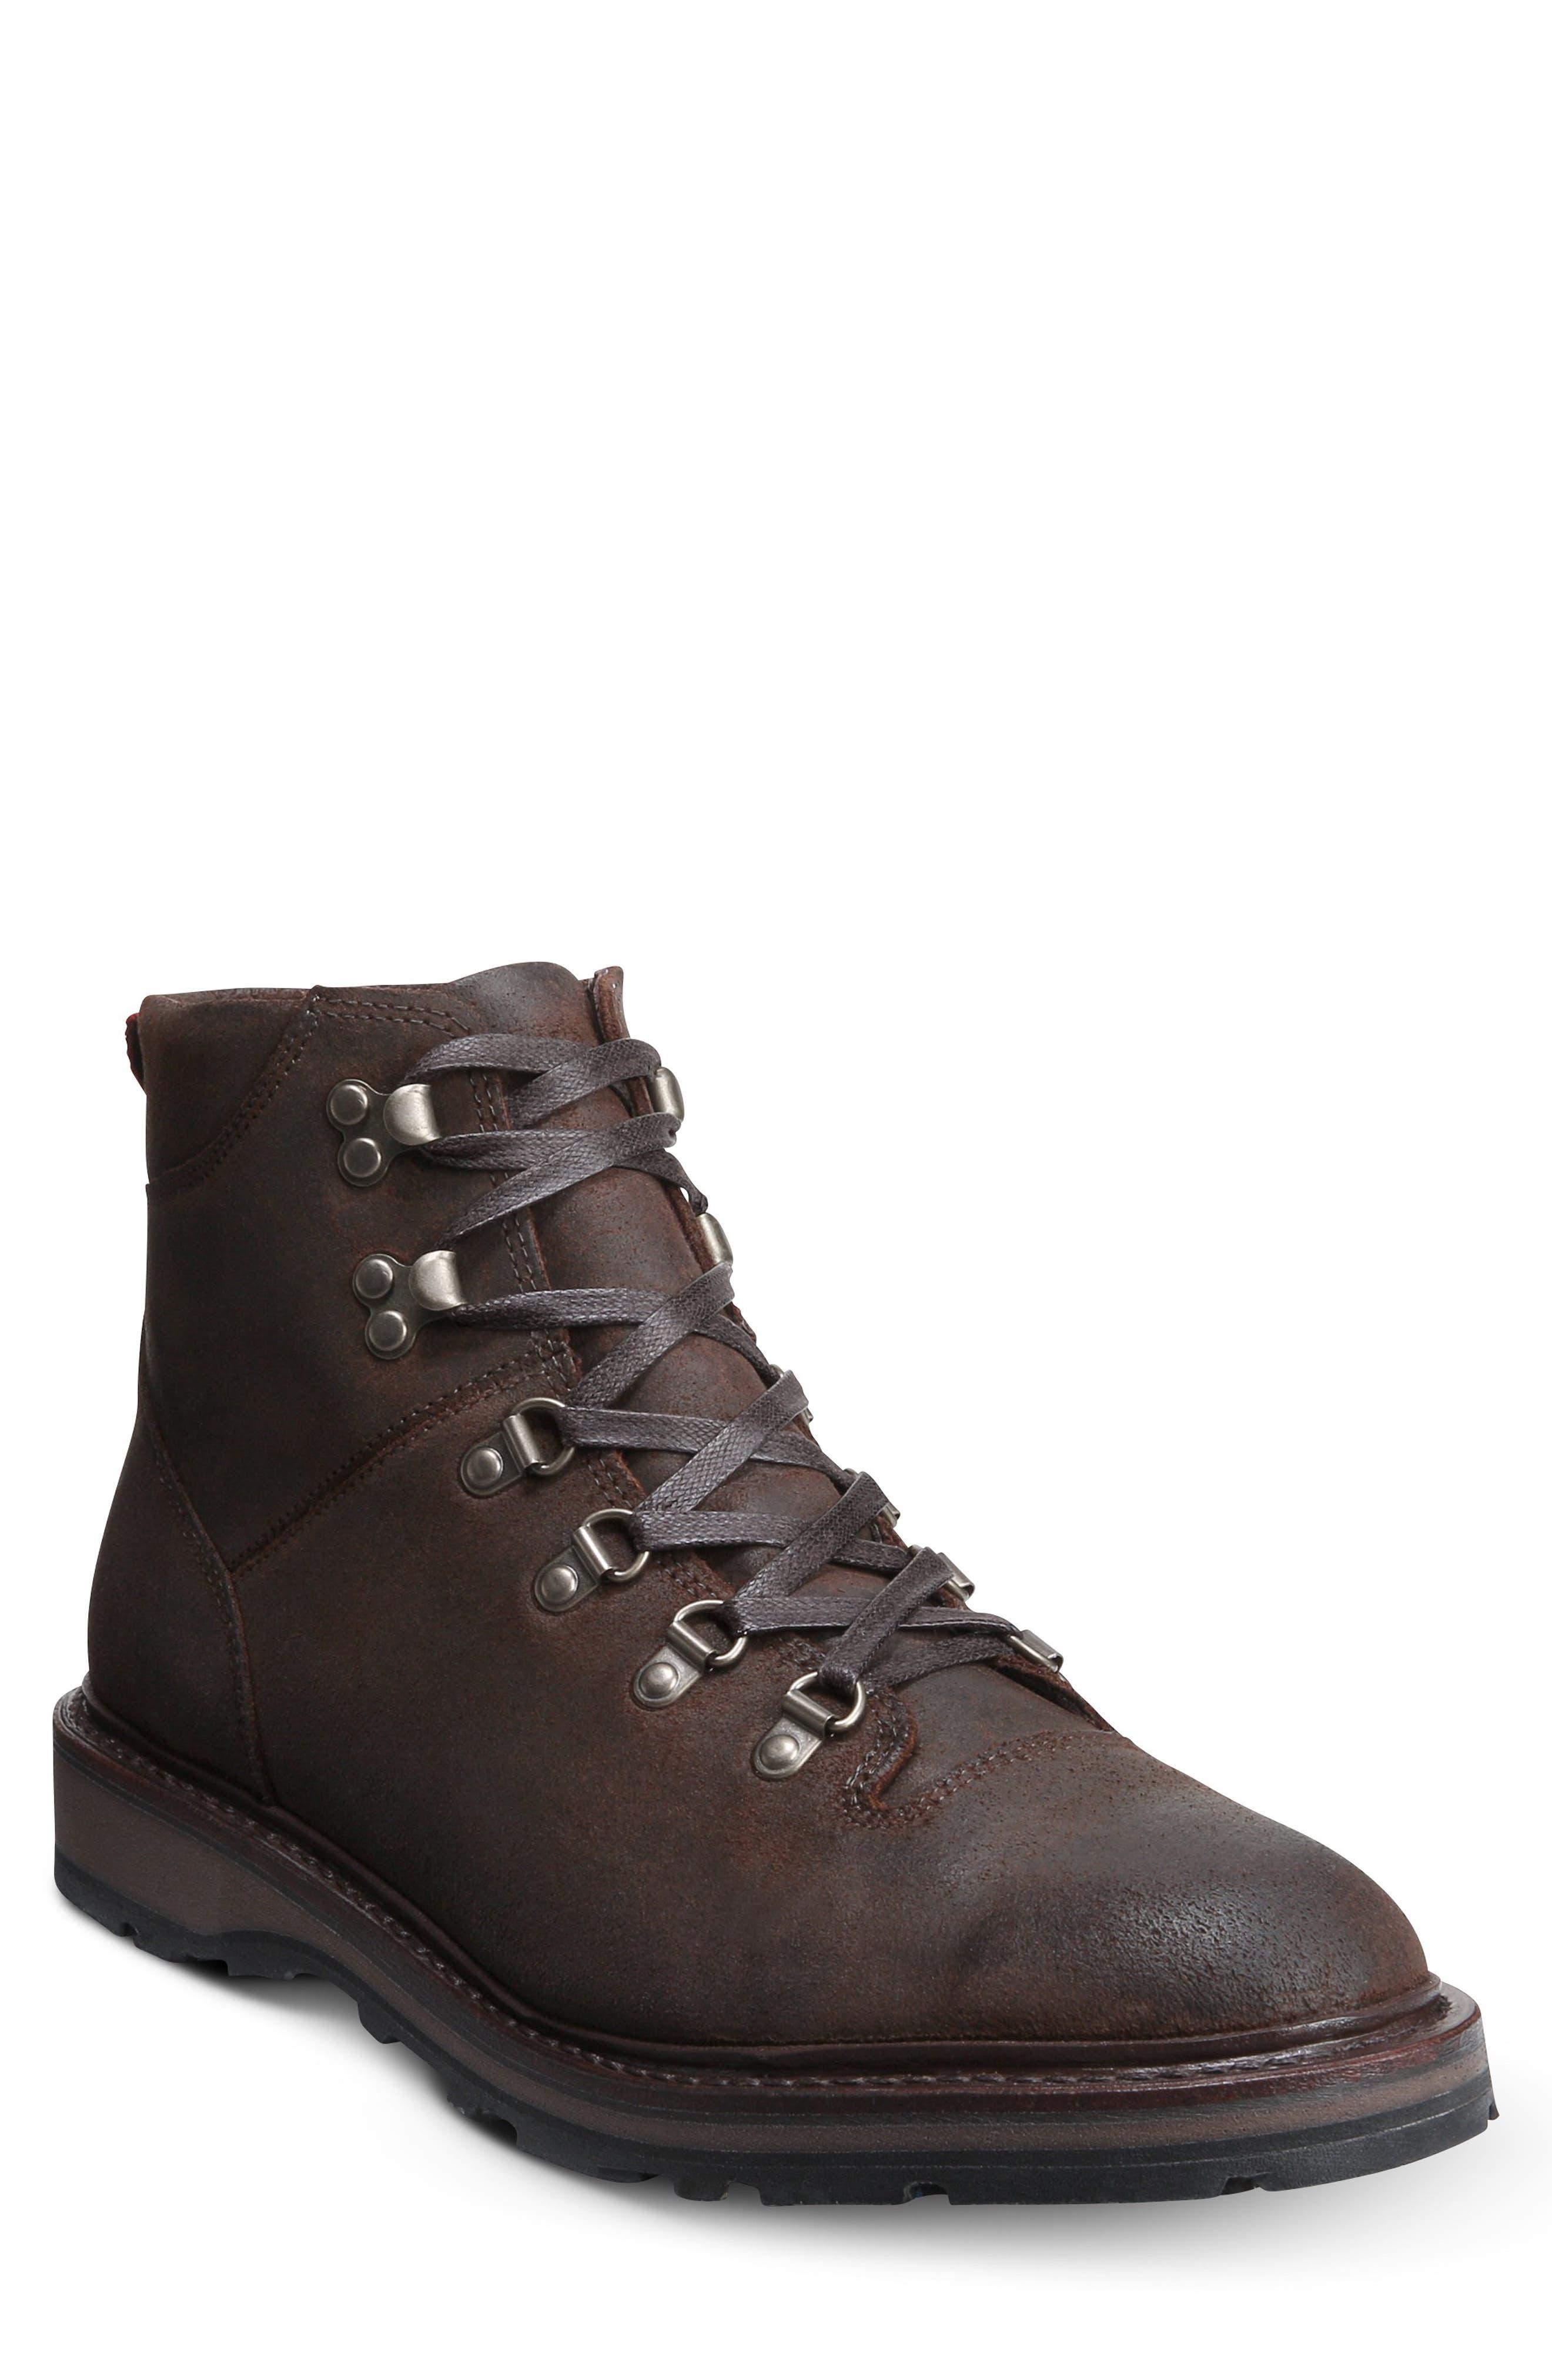 Rockies High Waterproof Plain Toe Boot